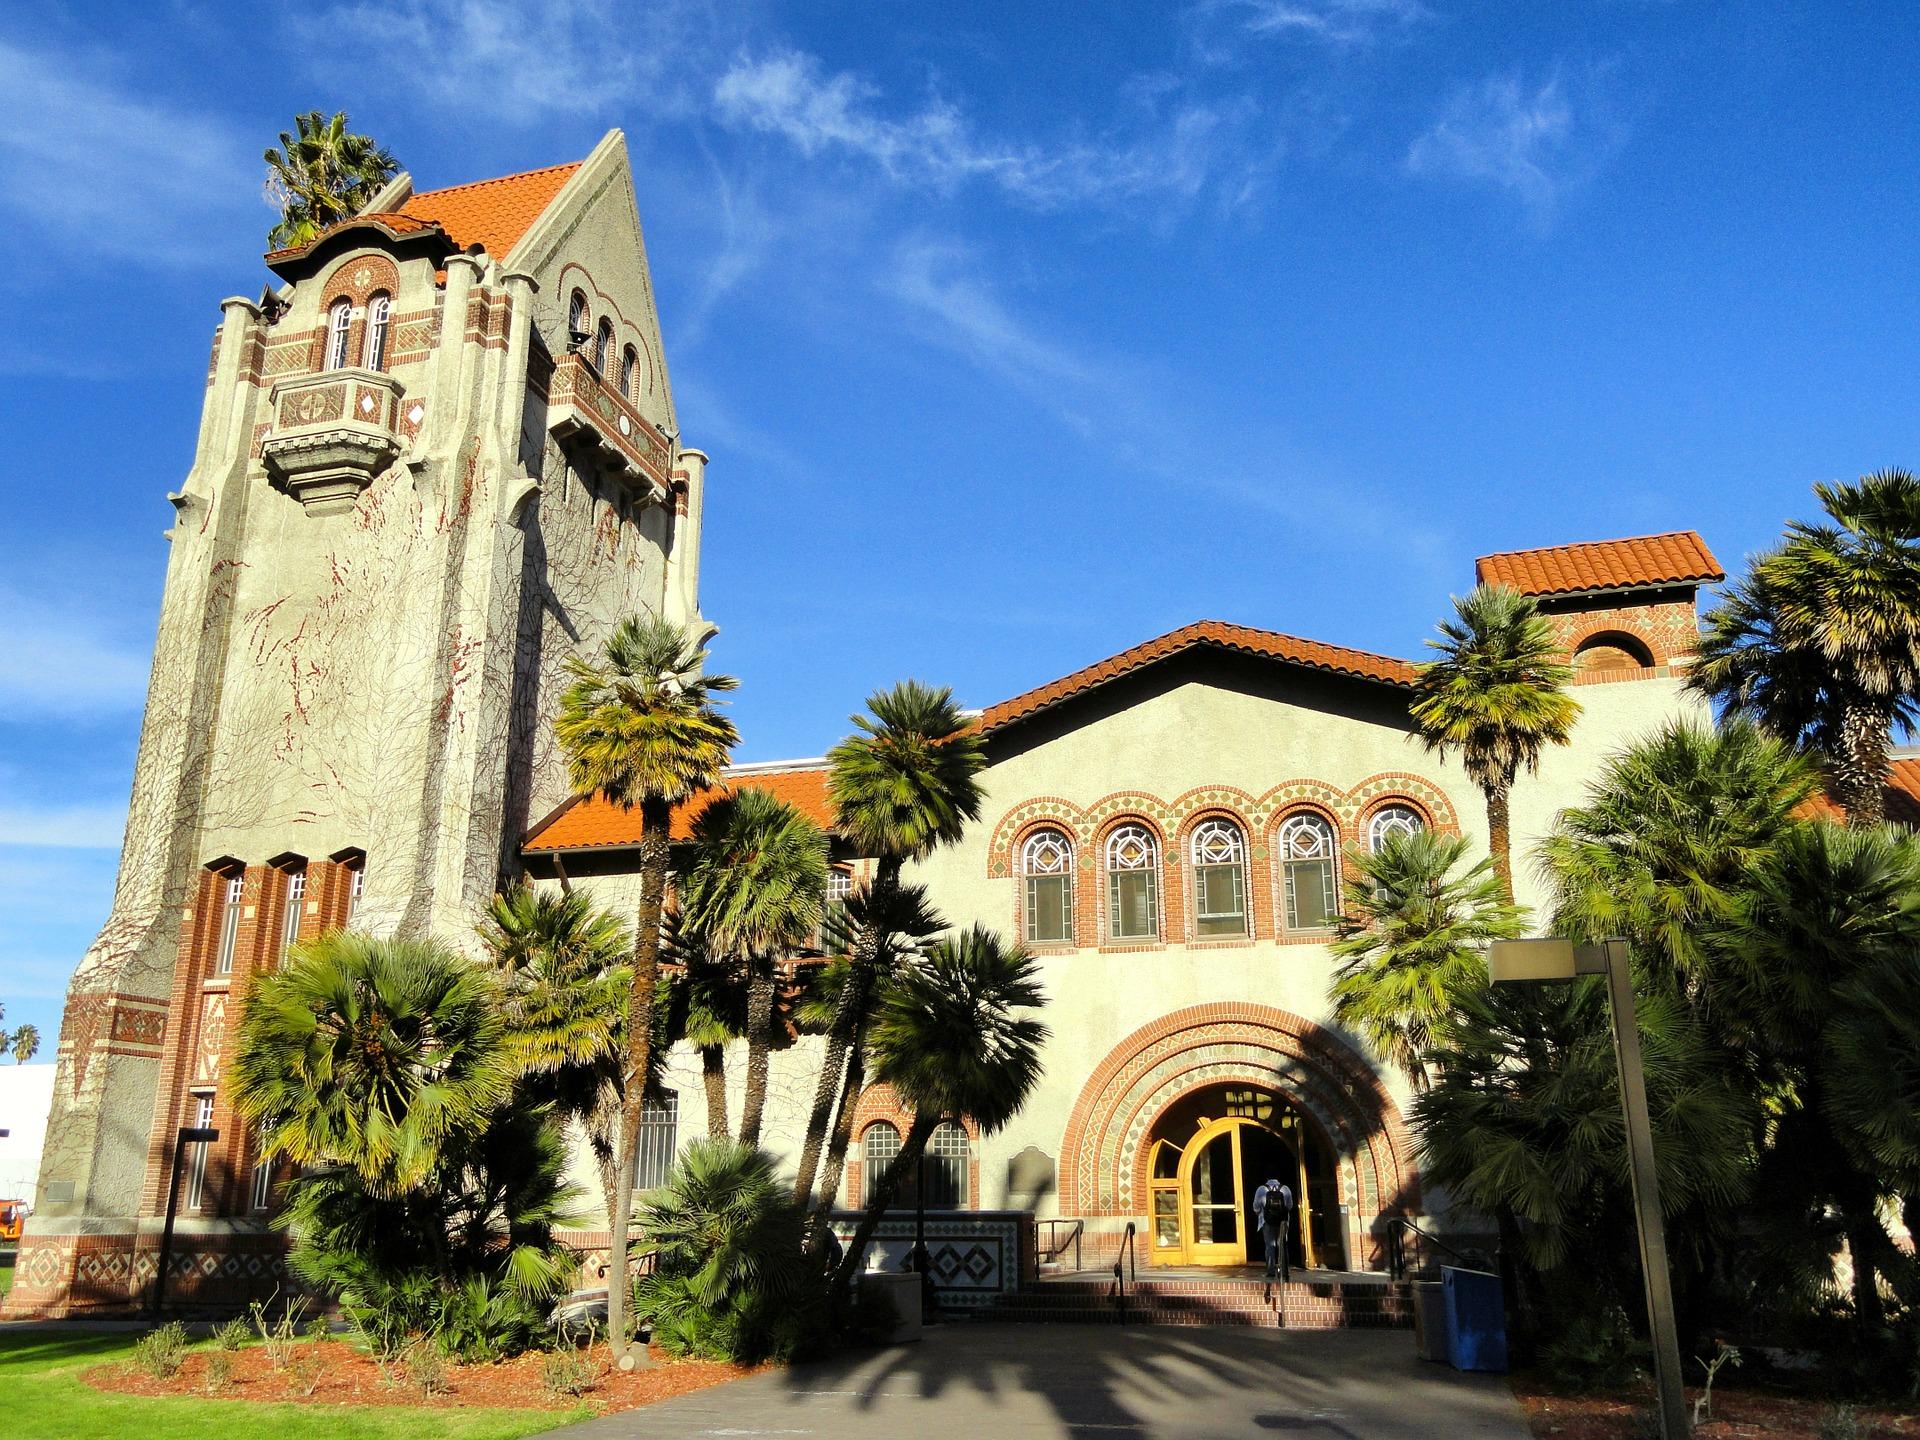 san-jose-state-university-106865_1920.jpg